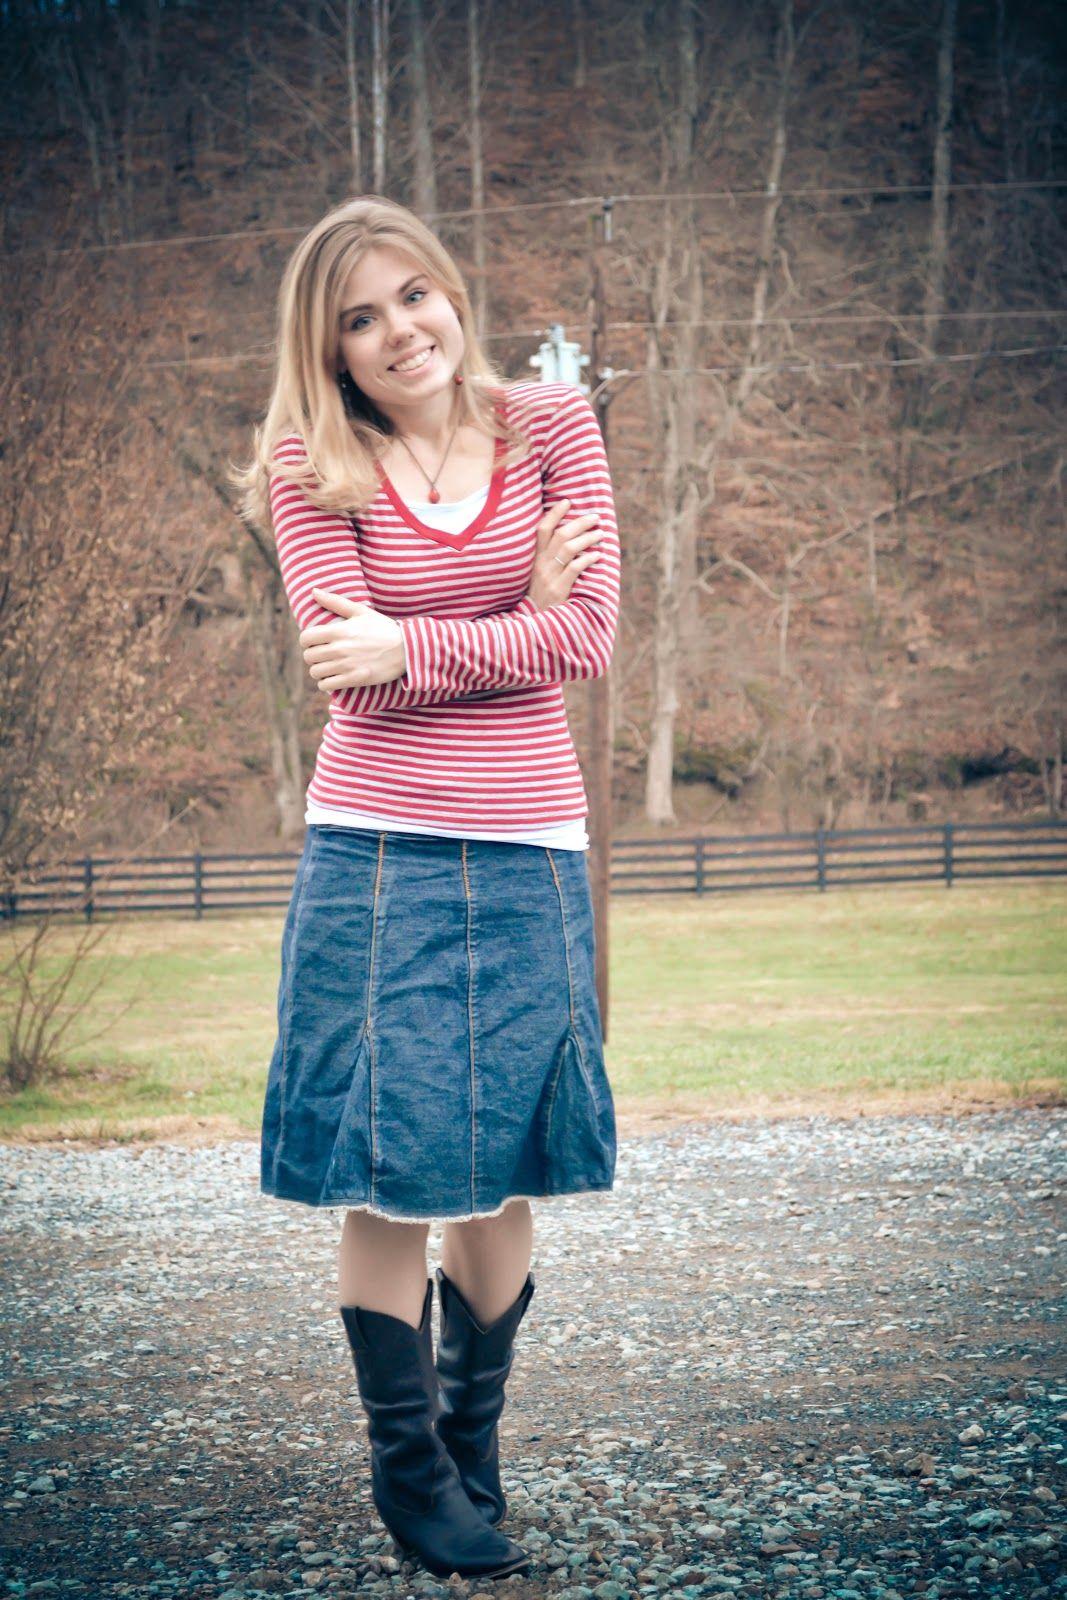 Teen's modest clothes